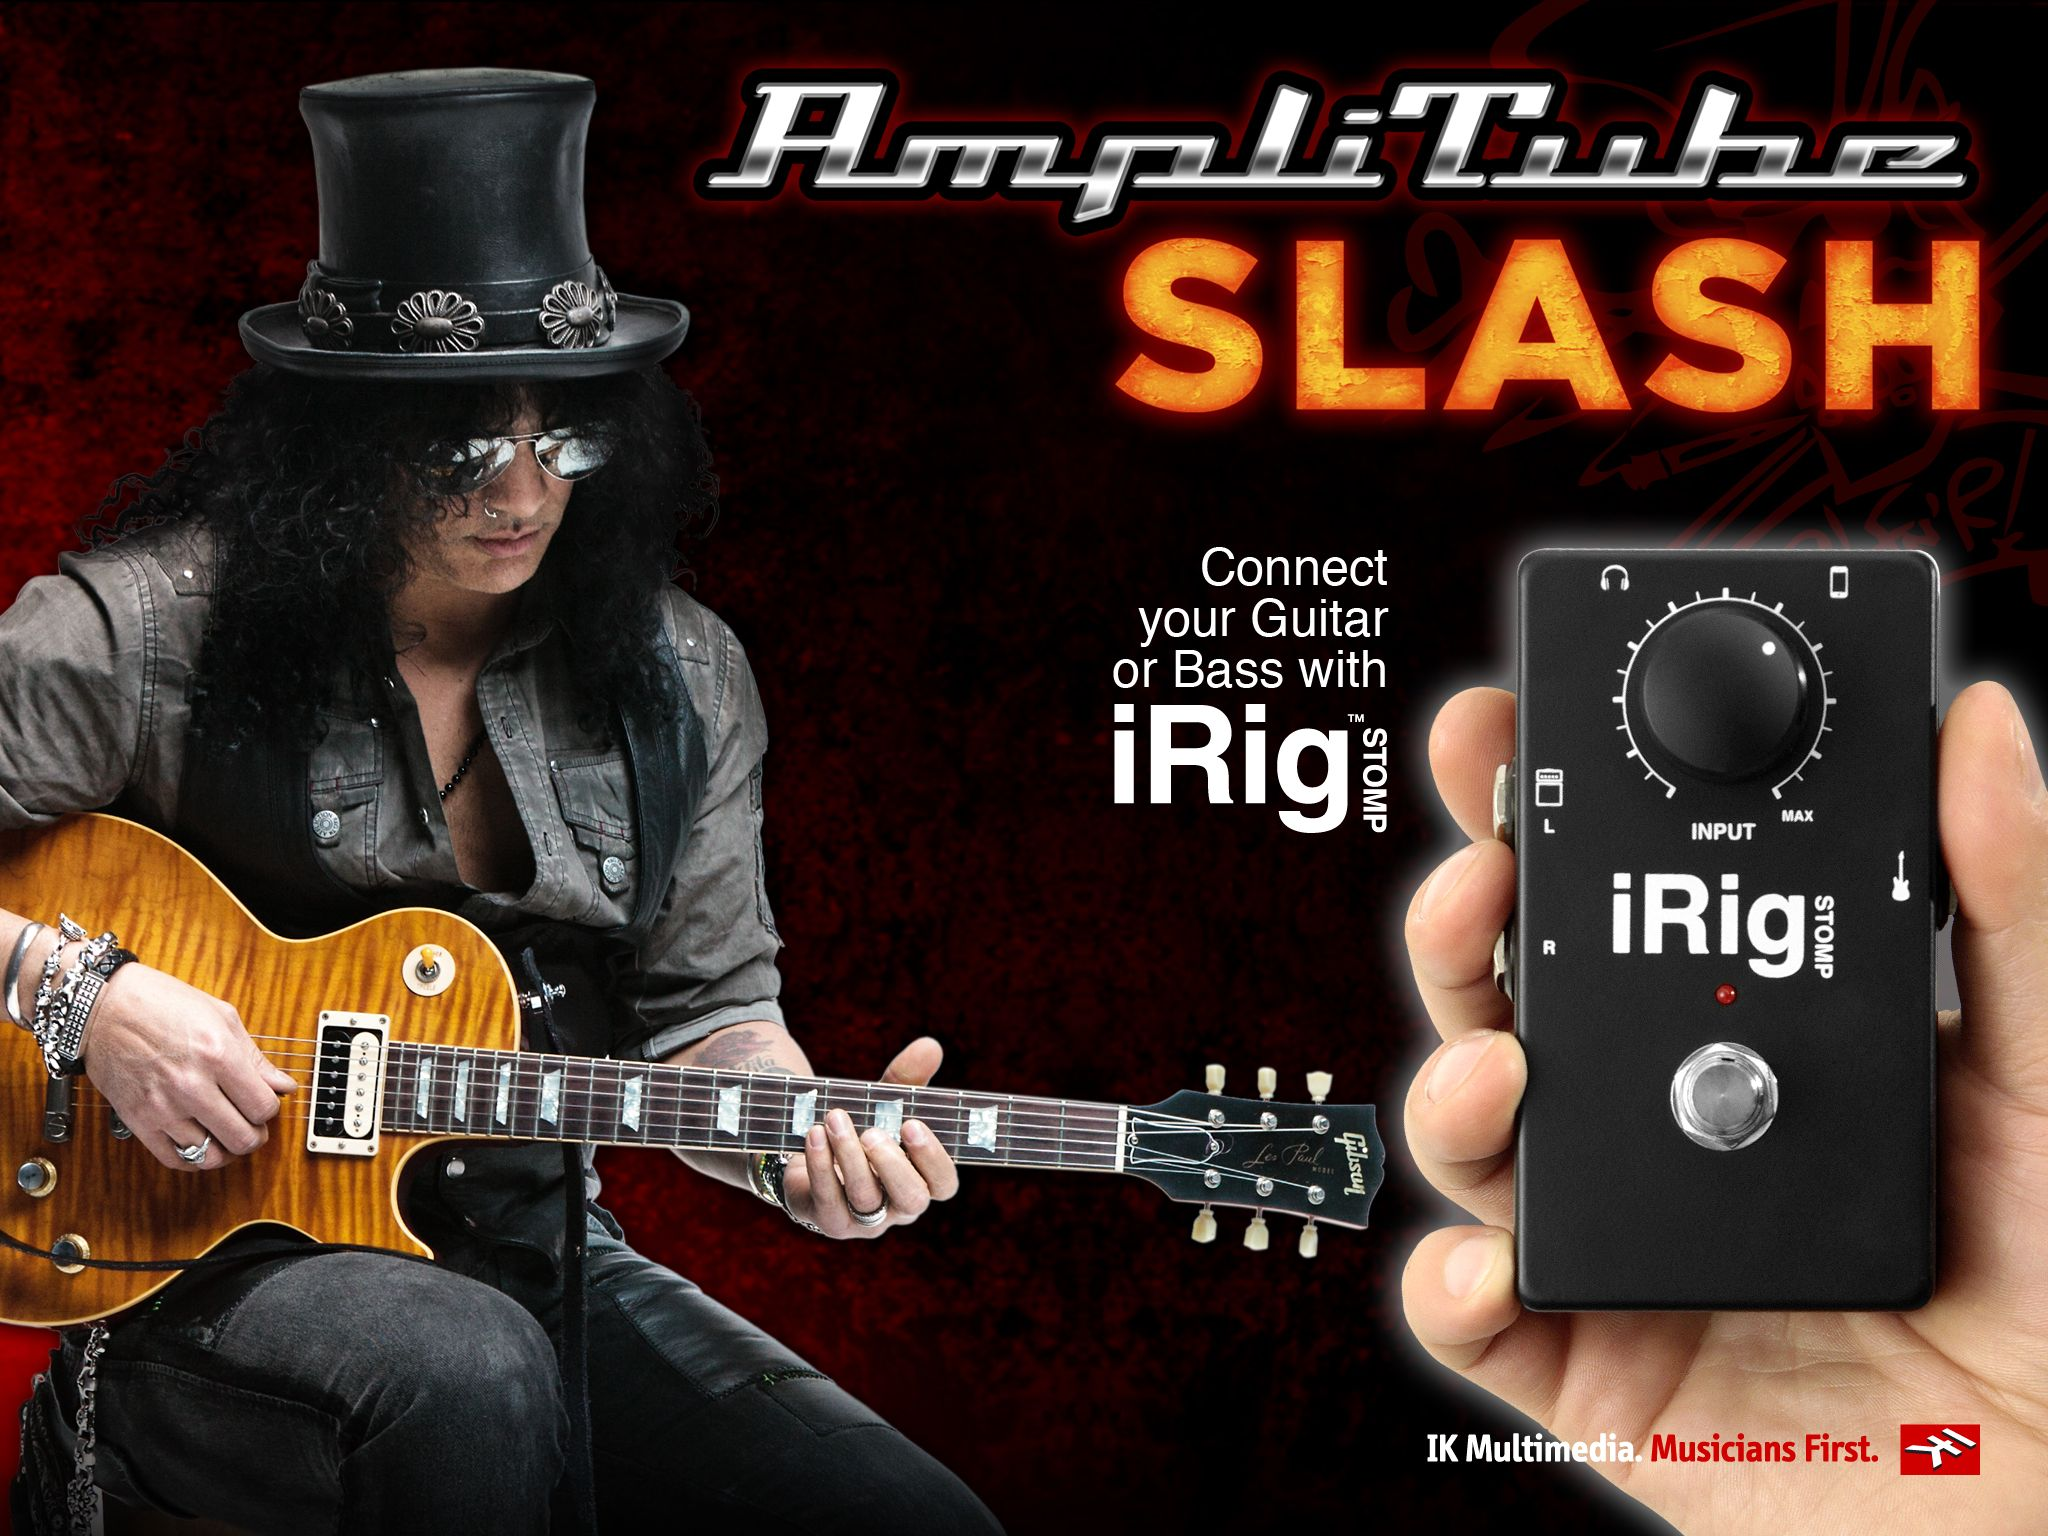 Amplitube Slash SS10